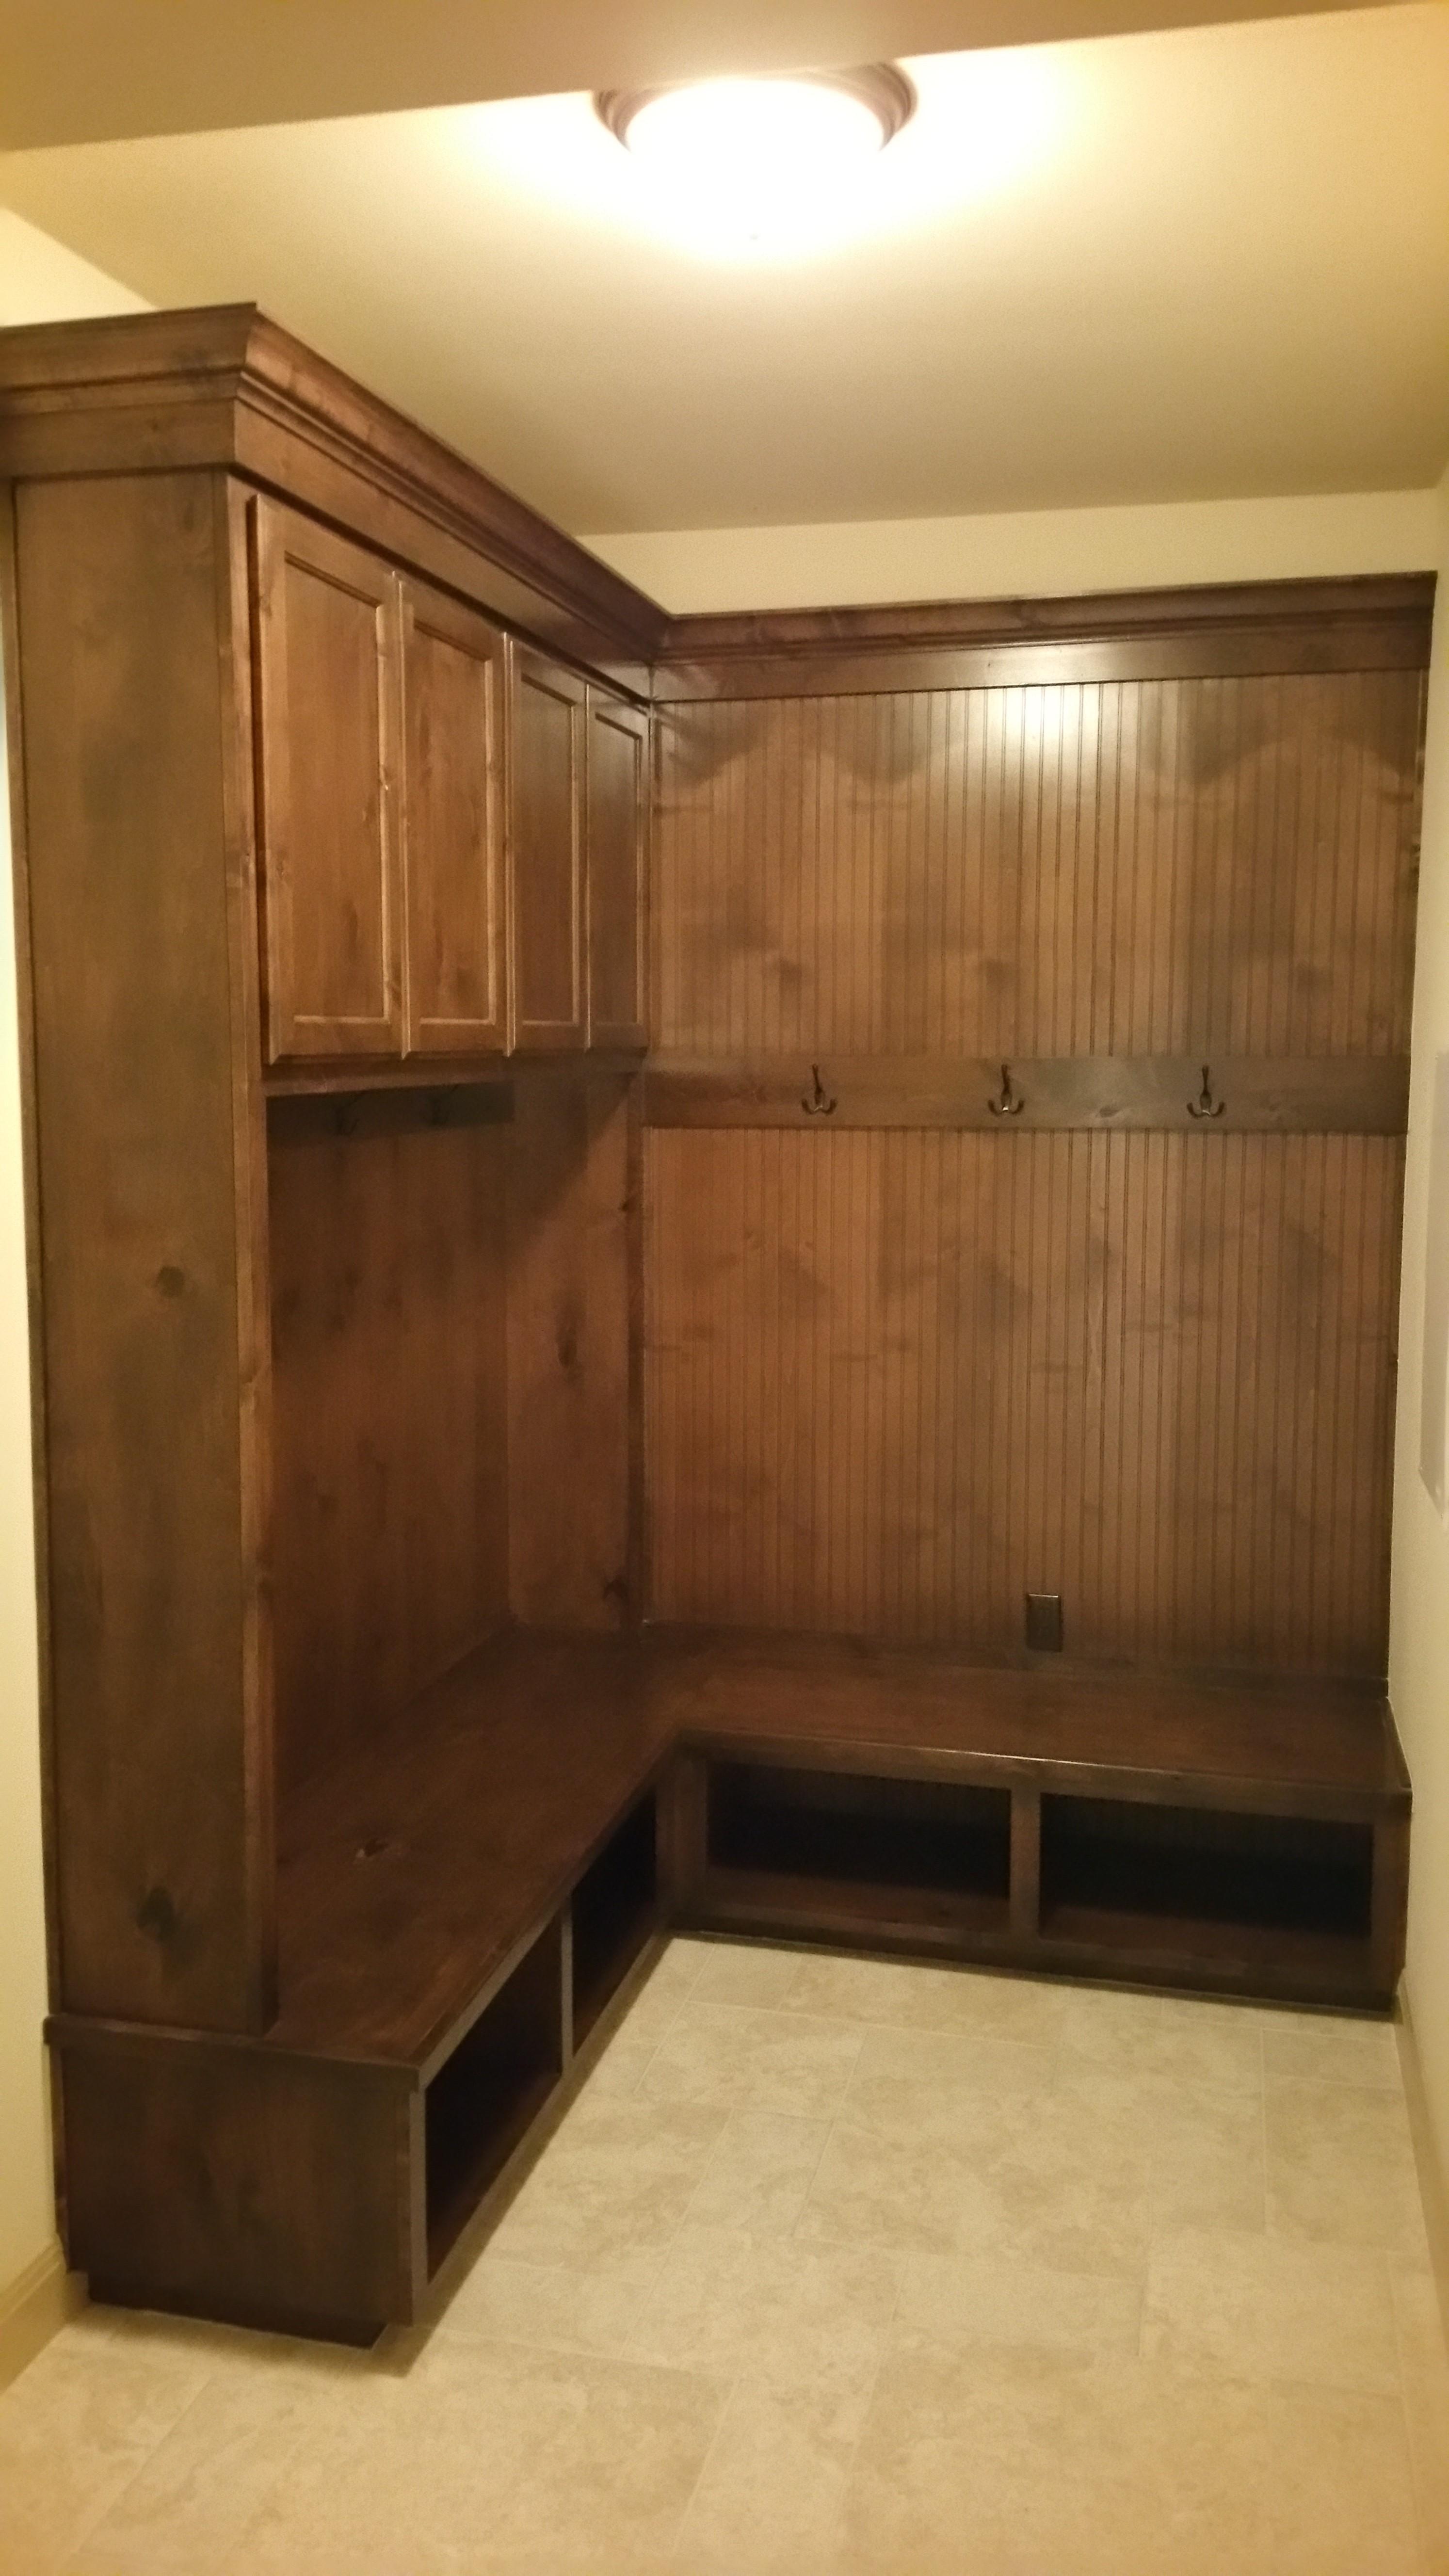 white dining room cabinet custom made by JB Murphy company